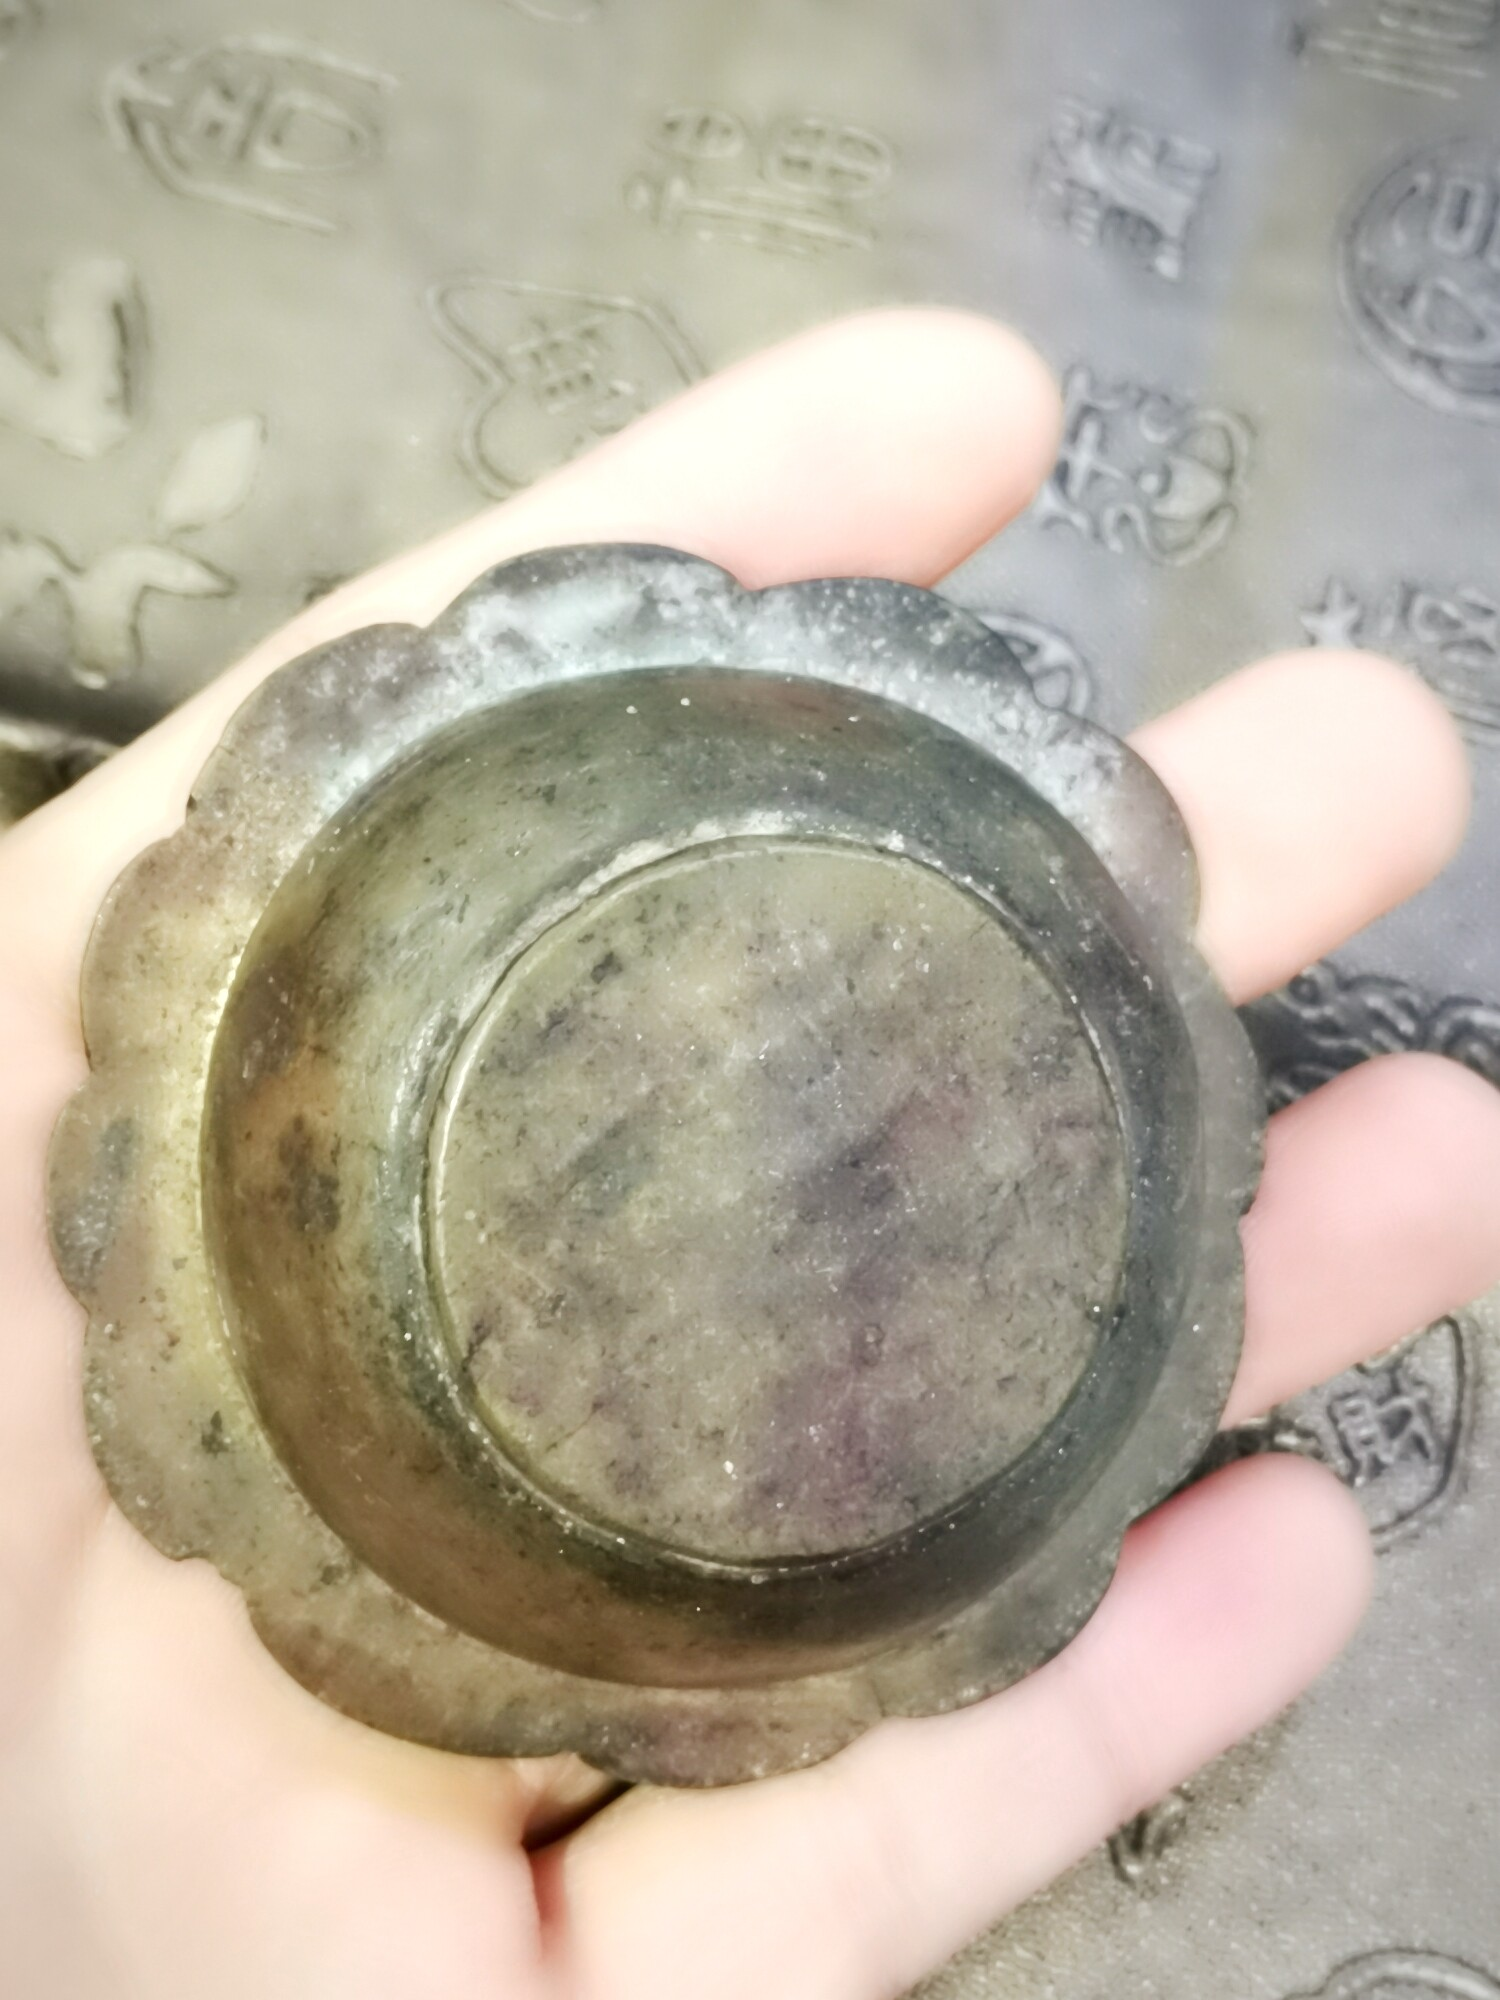 铜制香炉,年代未知,